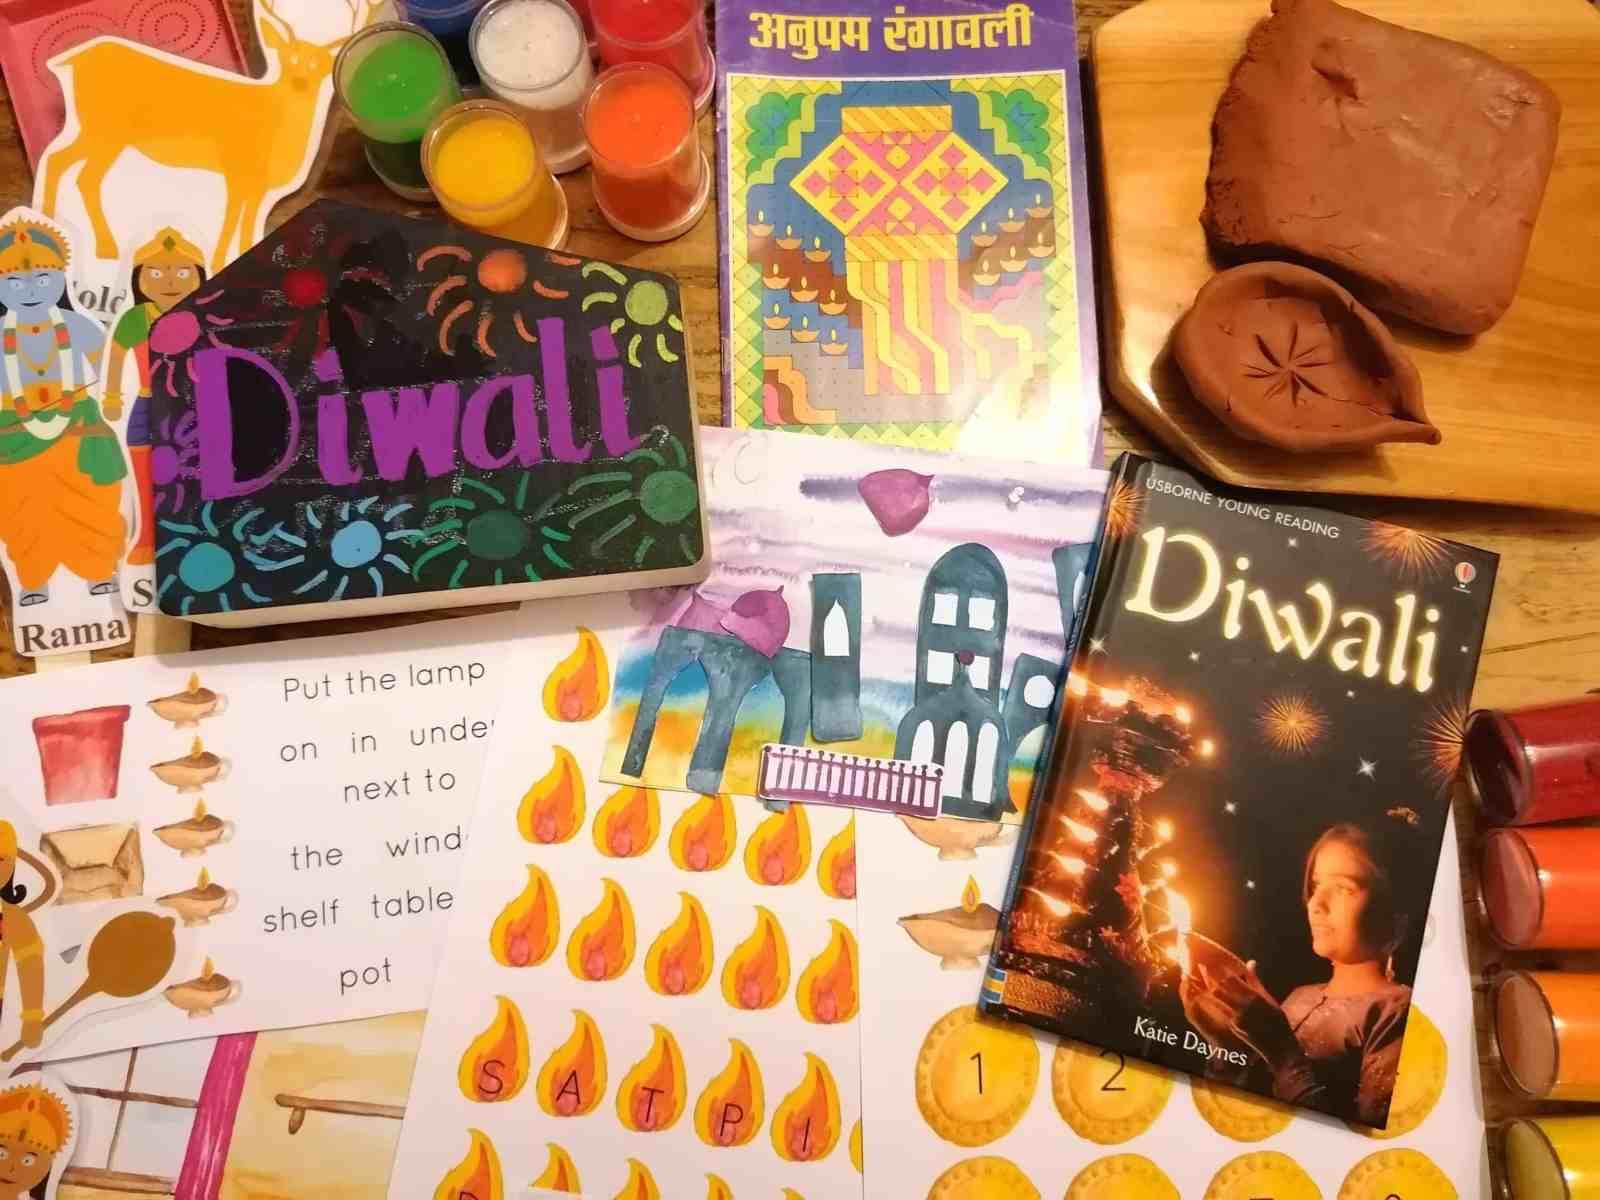 Diwali - diwali celebrations - 2019 - celebrations - festivals - diva lamp - Rangoli patterns - Rama and Sita - early years - topic ideas and themes